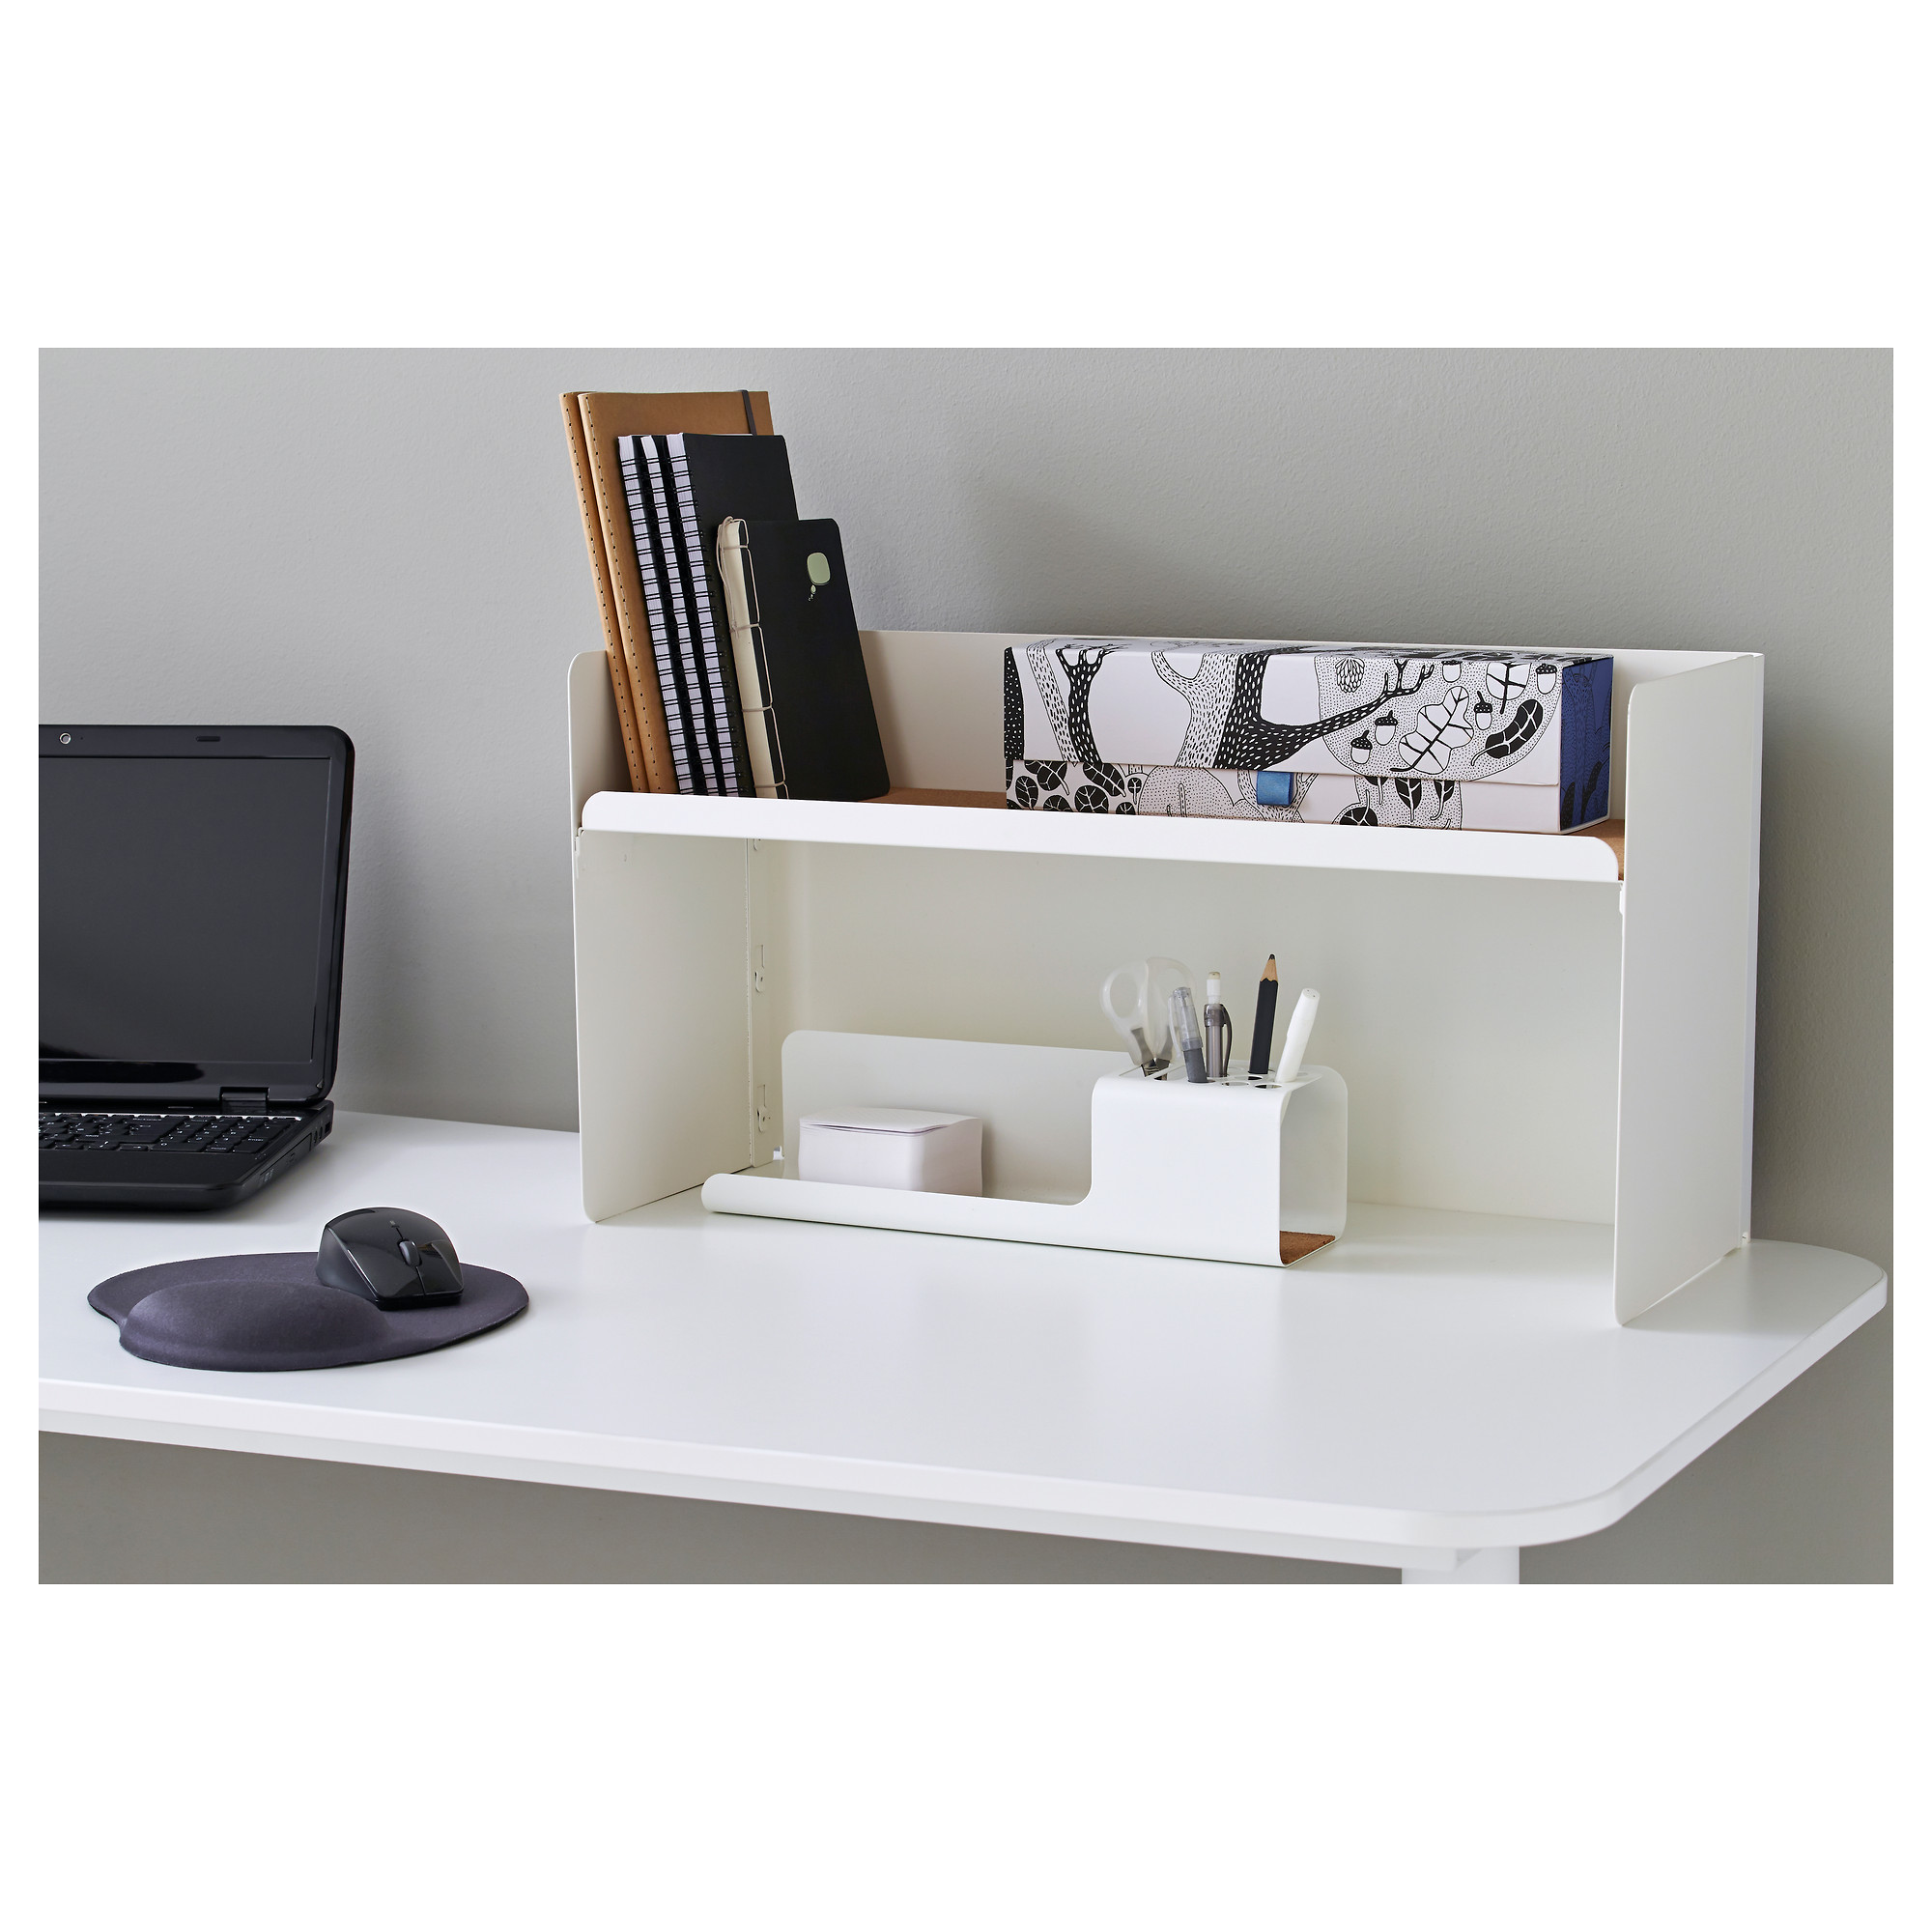 100 Home Design Ideas Free Download Hd Wallpapers: Desk And Shelves Desktop Wallpaper (50+ Images